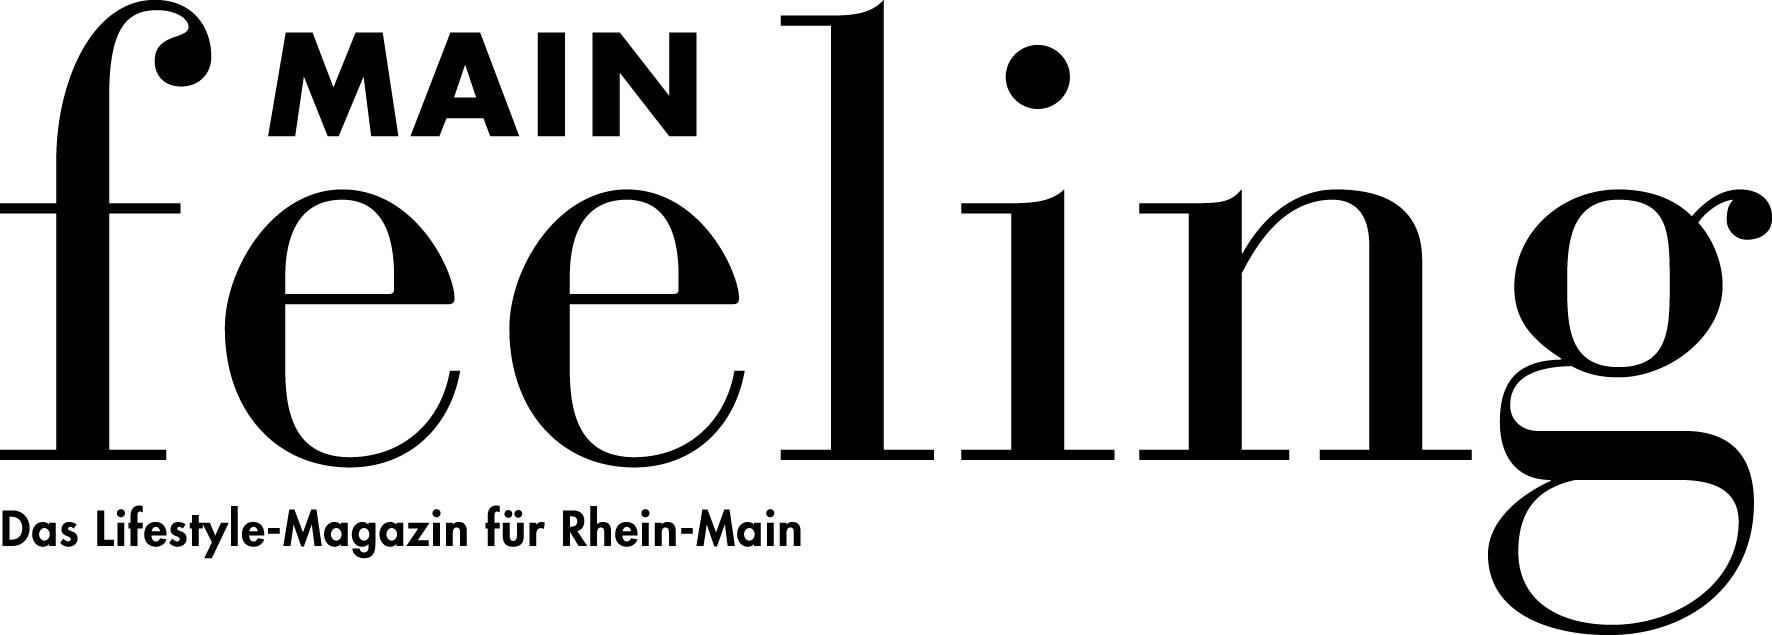 MAINfeeling_Logo_mit_Slogan.indd